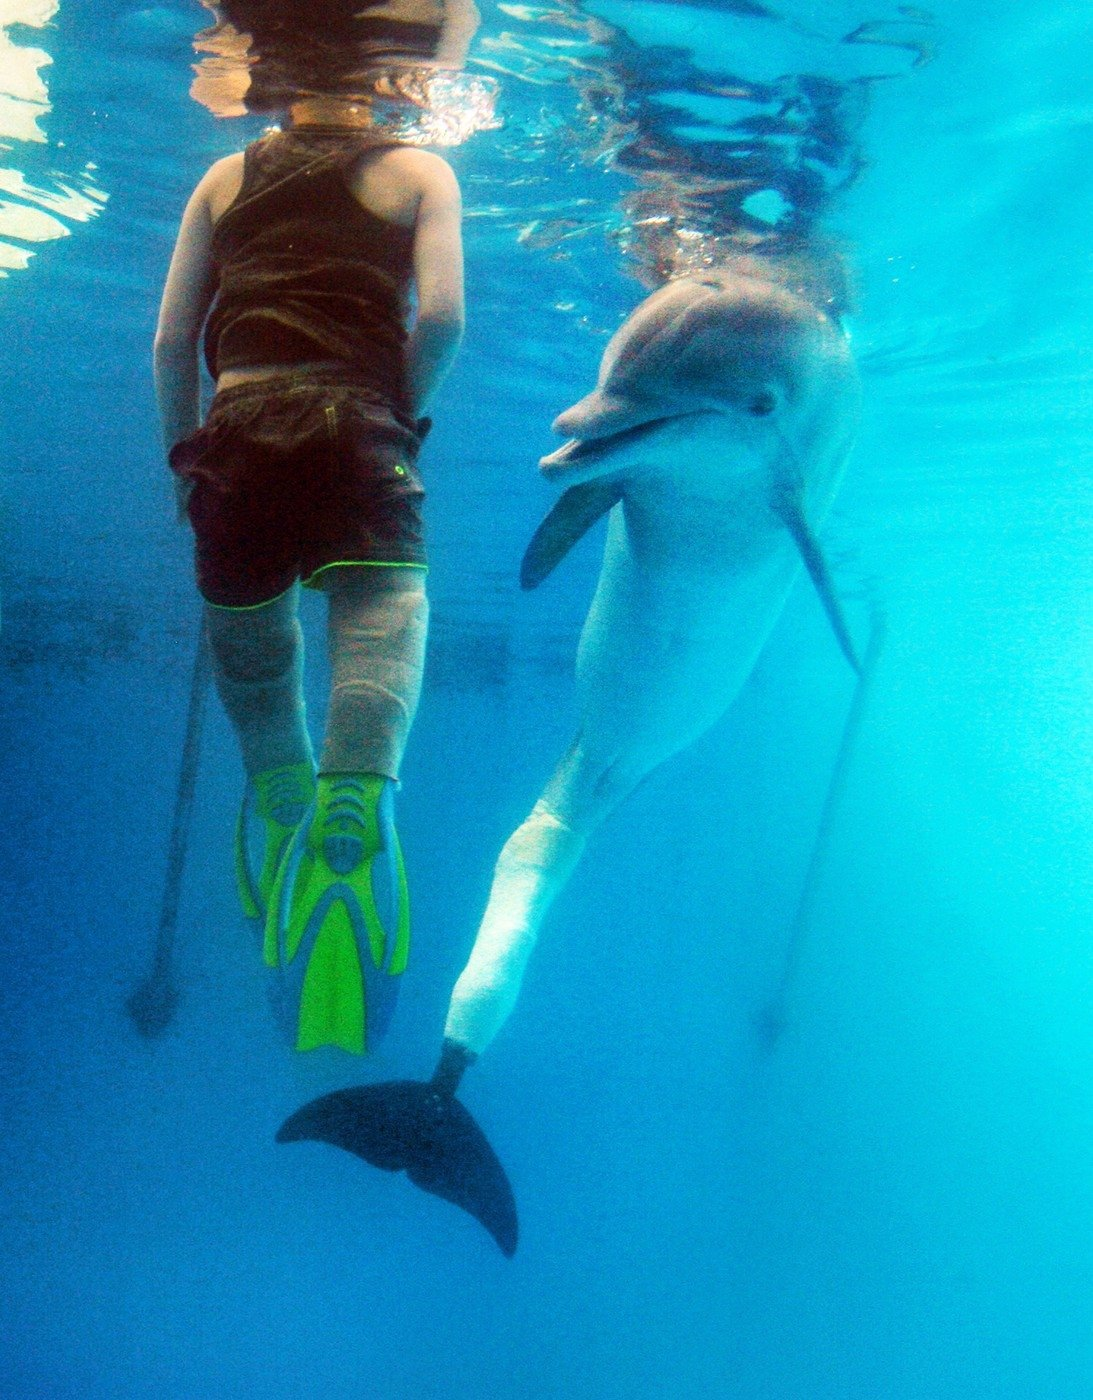 Dojemné: Beznohý chlapec si zaplaval se slavným delfínem